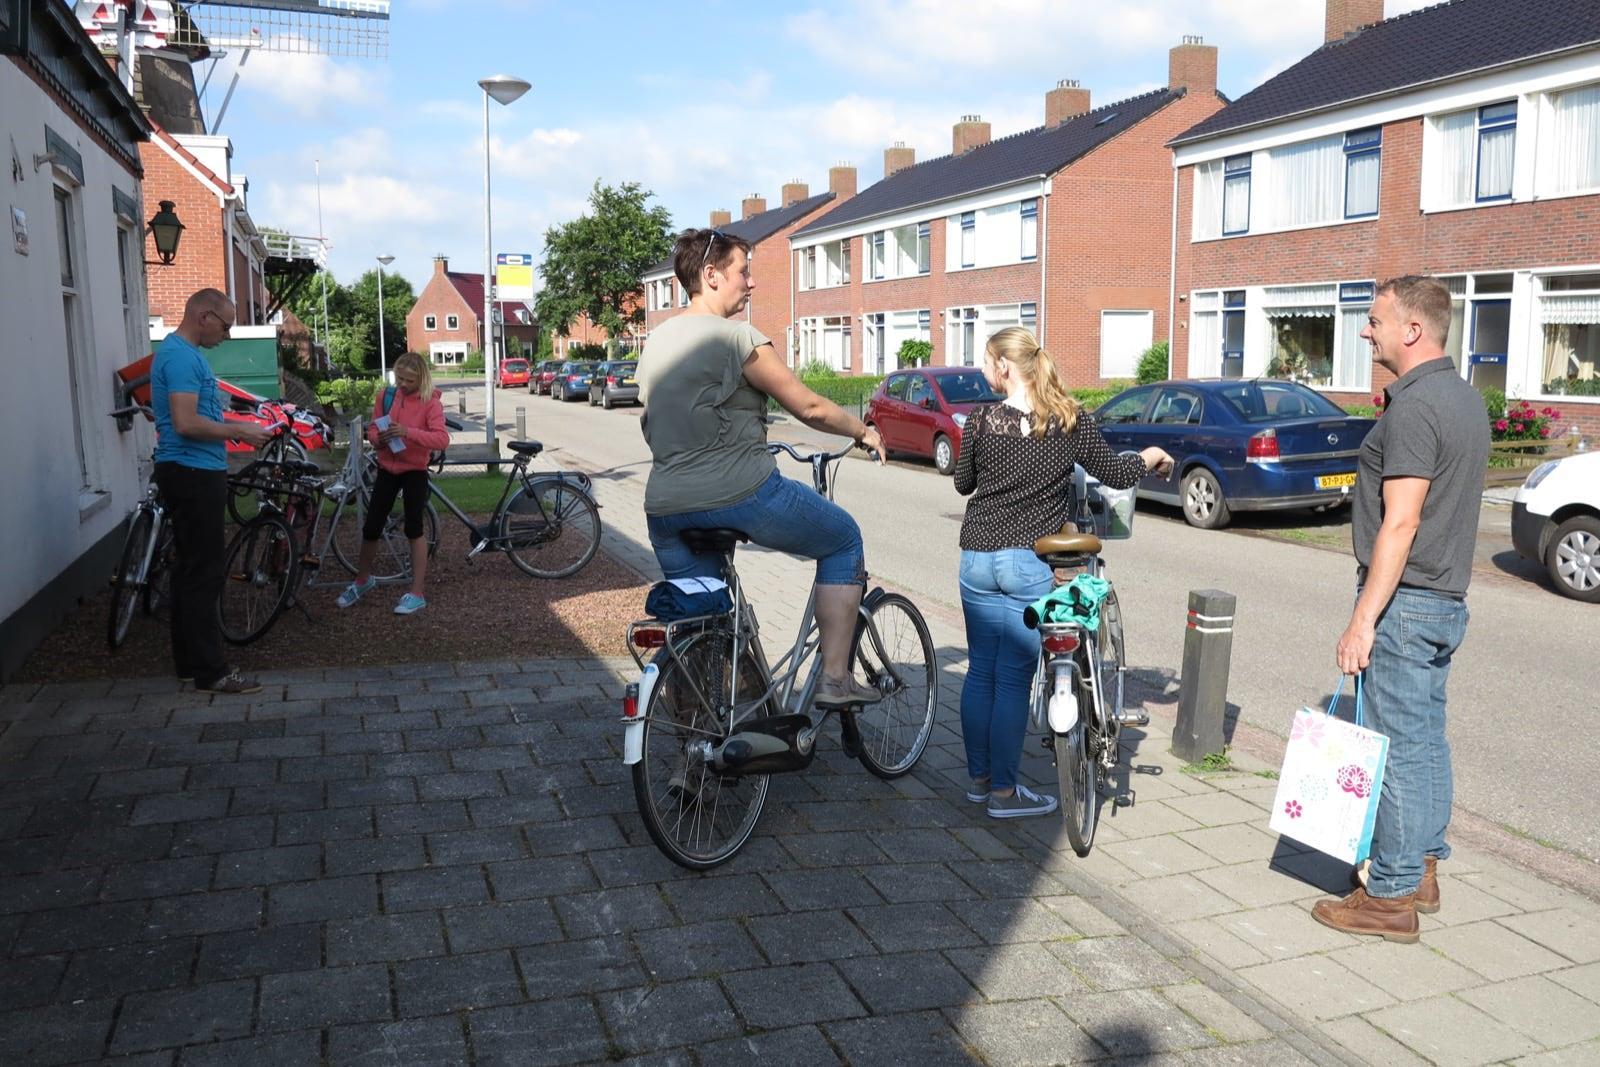 et-fiets-en-fietser-45-thesinger-fietstocht-cor-en-titia-van-zanten-en-dochters-oi.jpg